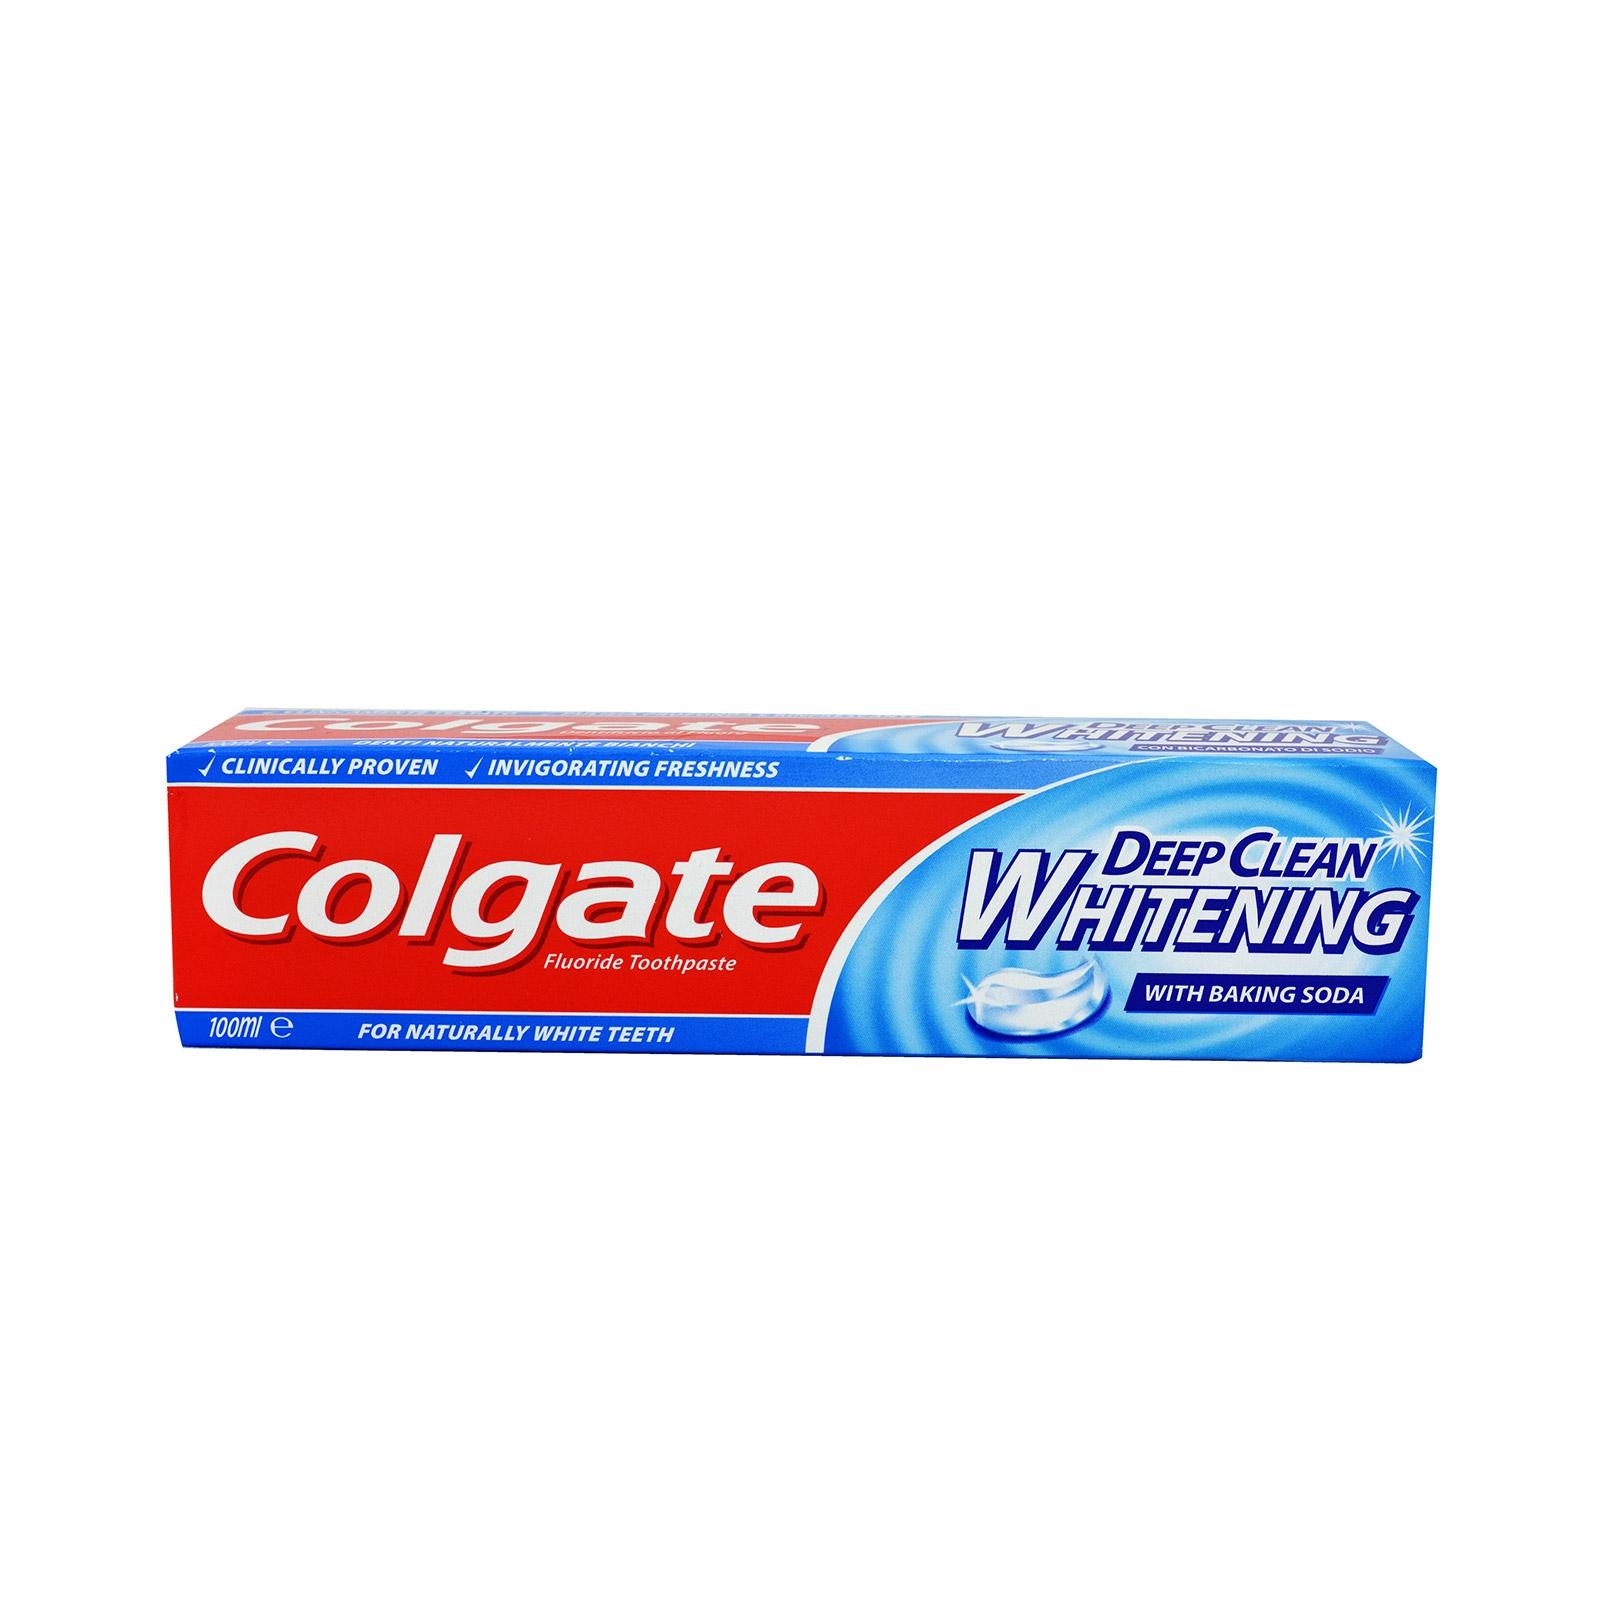 COLGATE Deep Clean Whitening Dentifricio 100ml